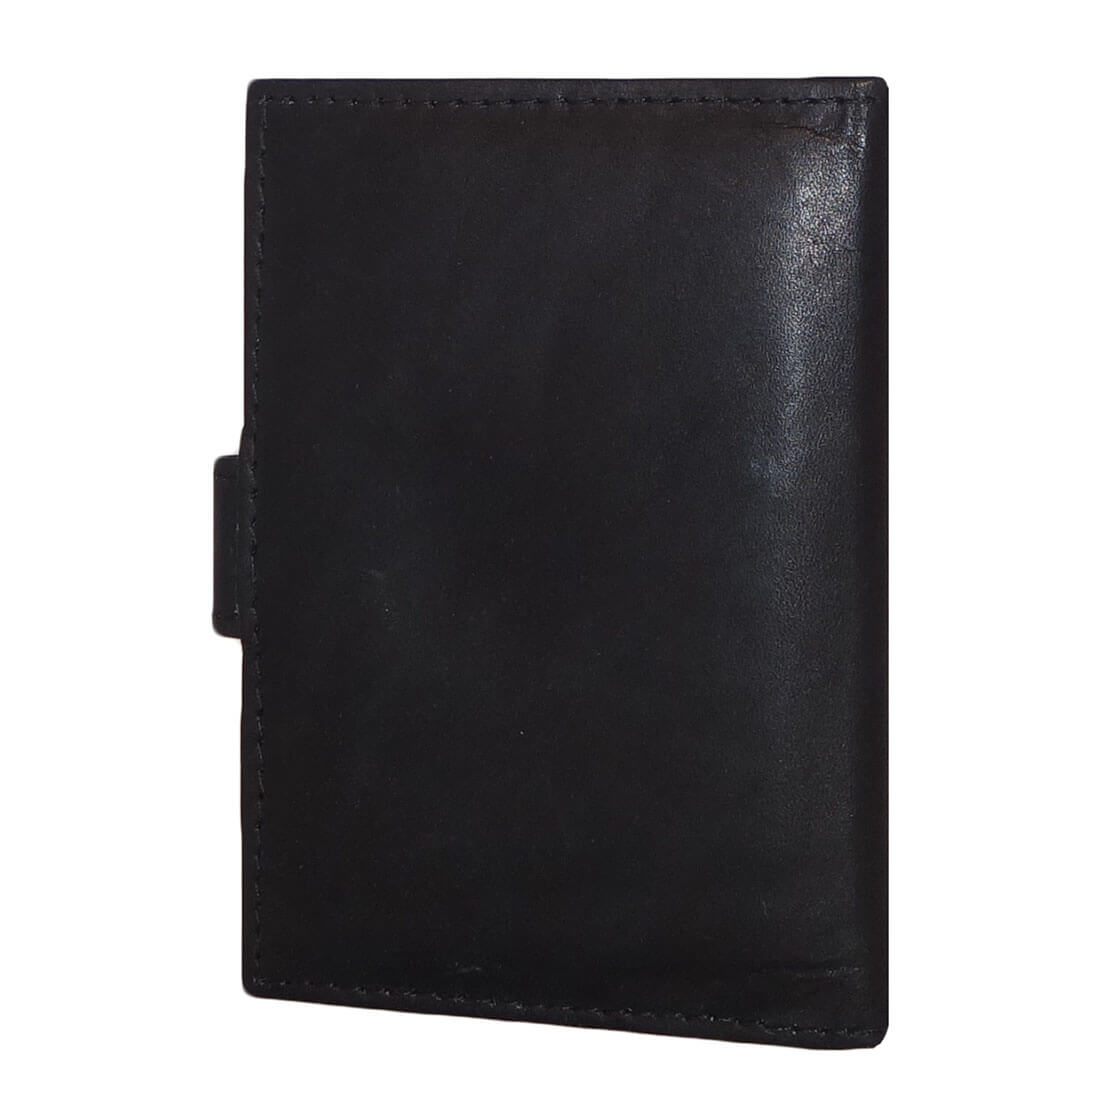 Leren Pasjeshouder Zwart-19770